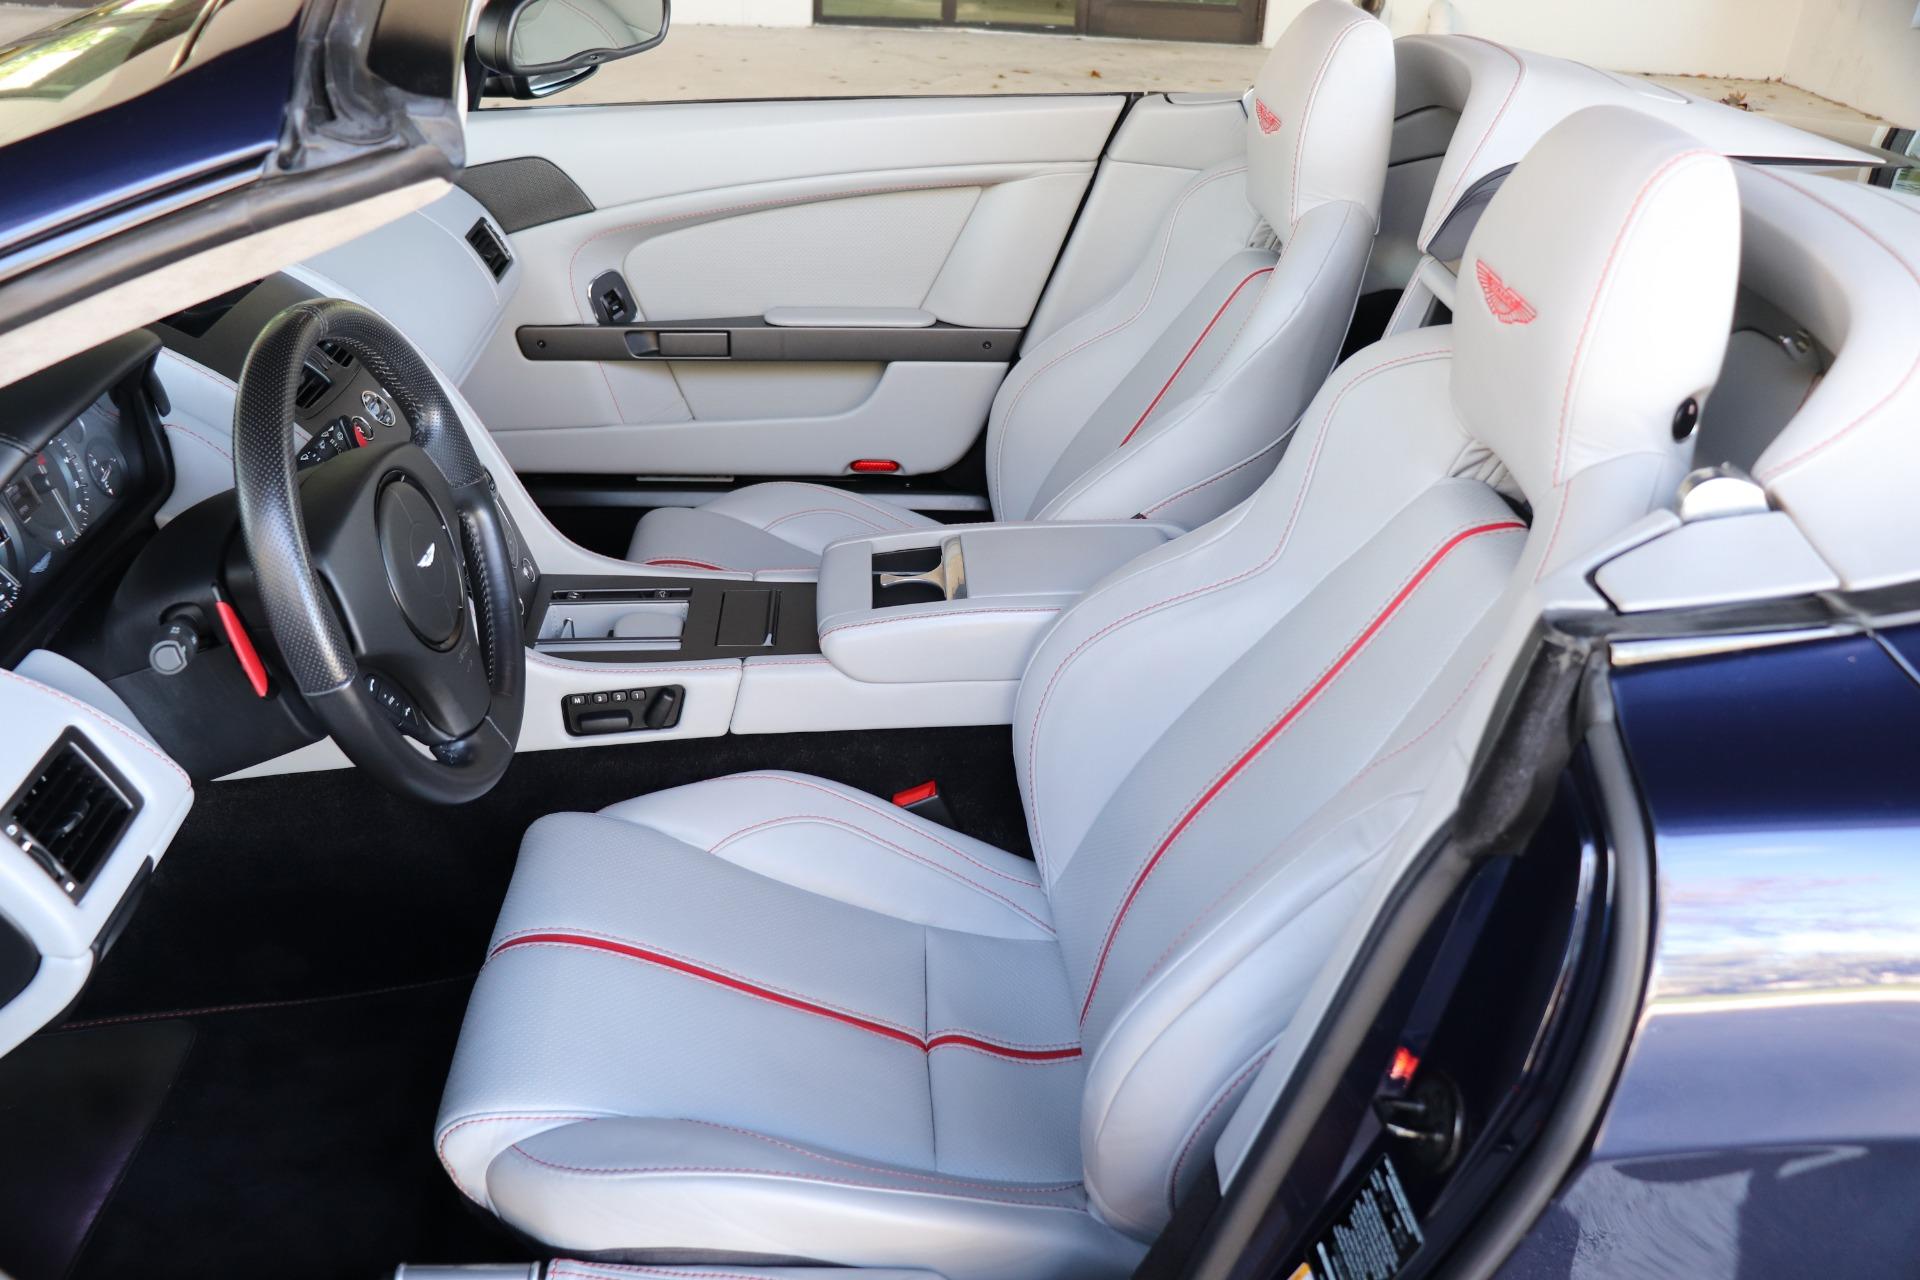 Used-2016-Aston-Martin-V8-Vantage-GT-Roadster